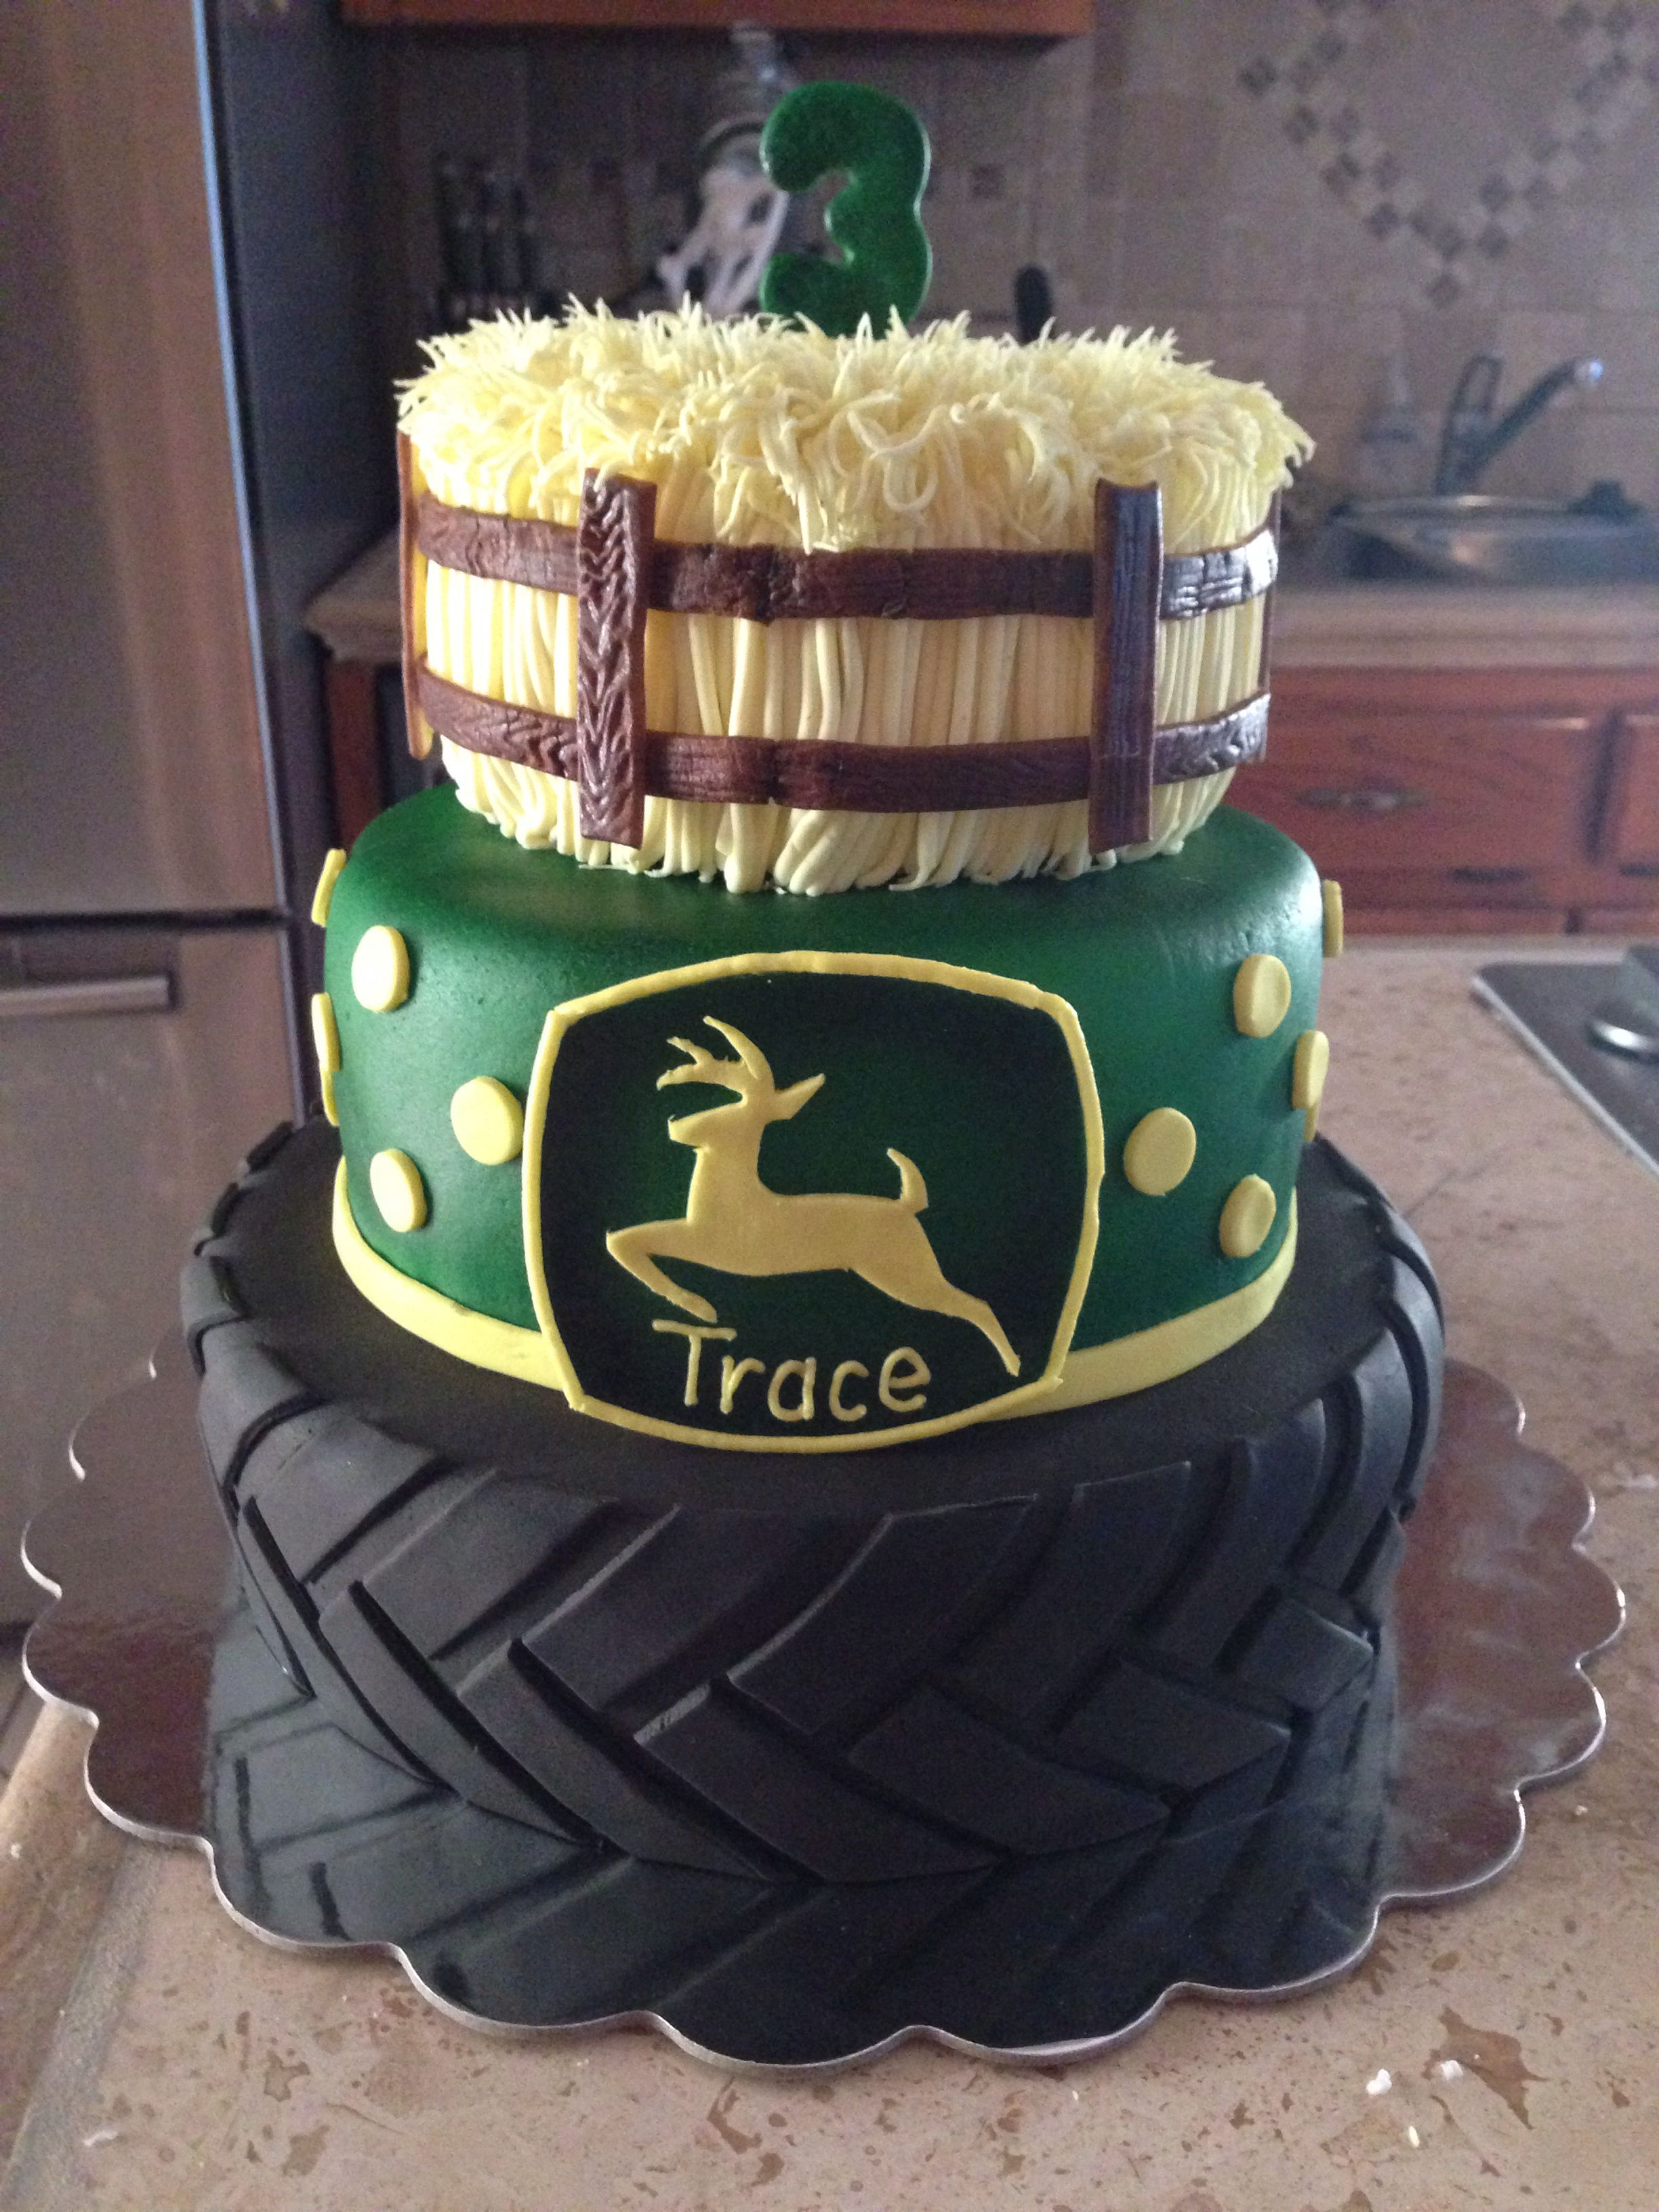 John Deere Cake I Made Mallory Gray 50 Cakes Of Memphis TN